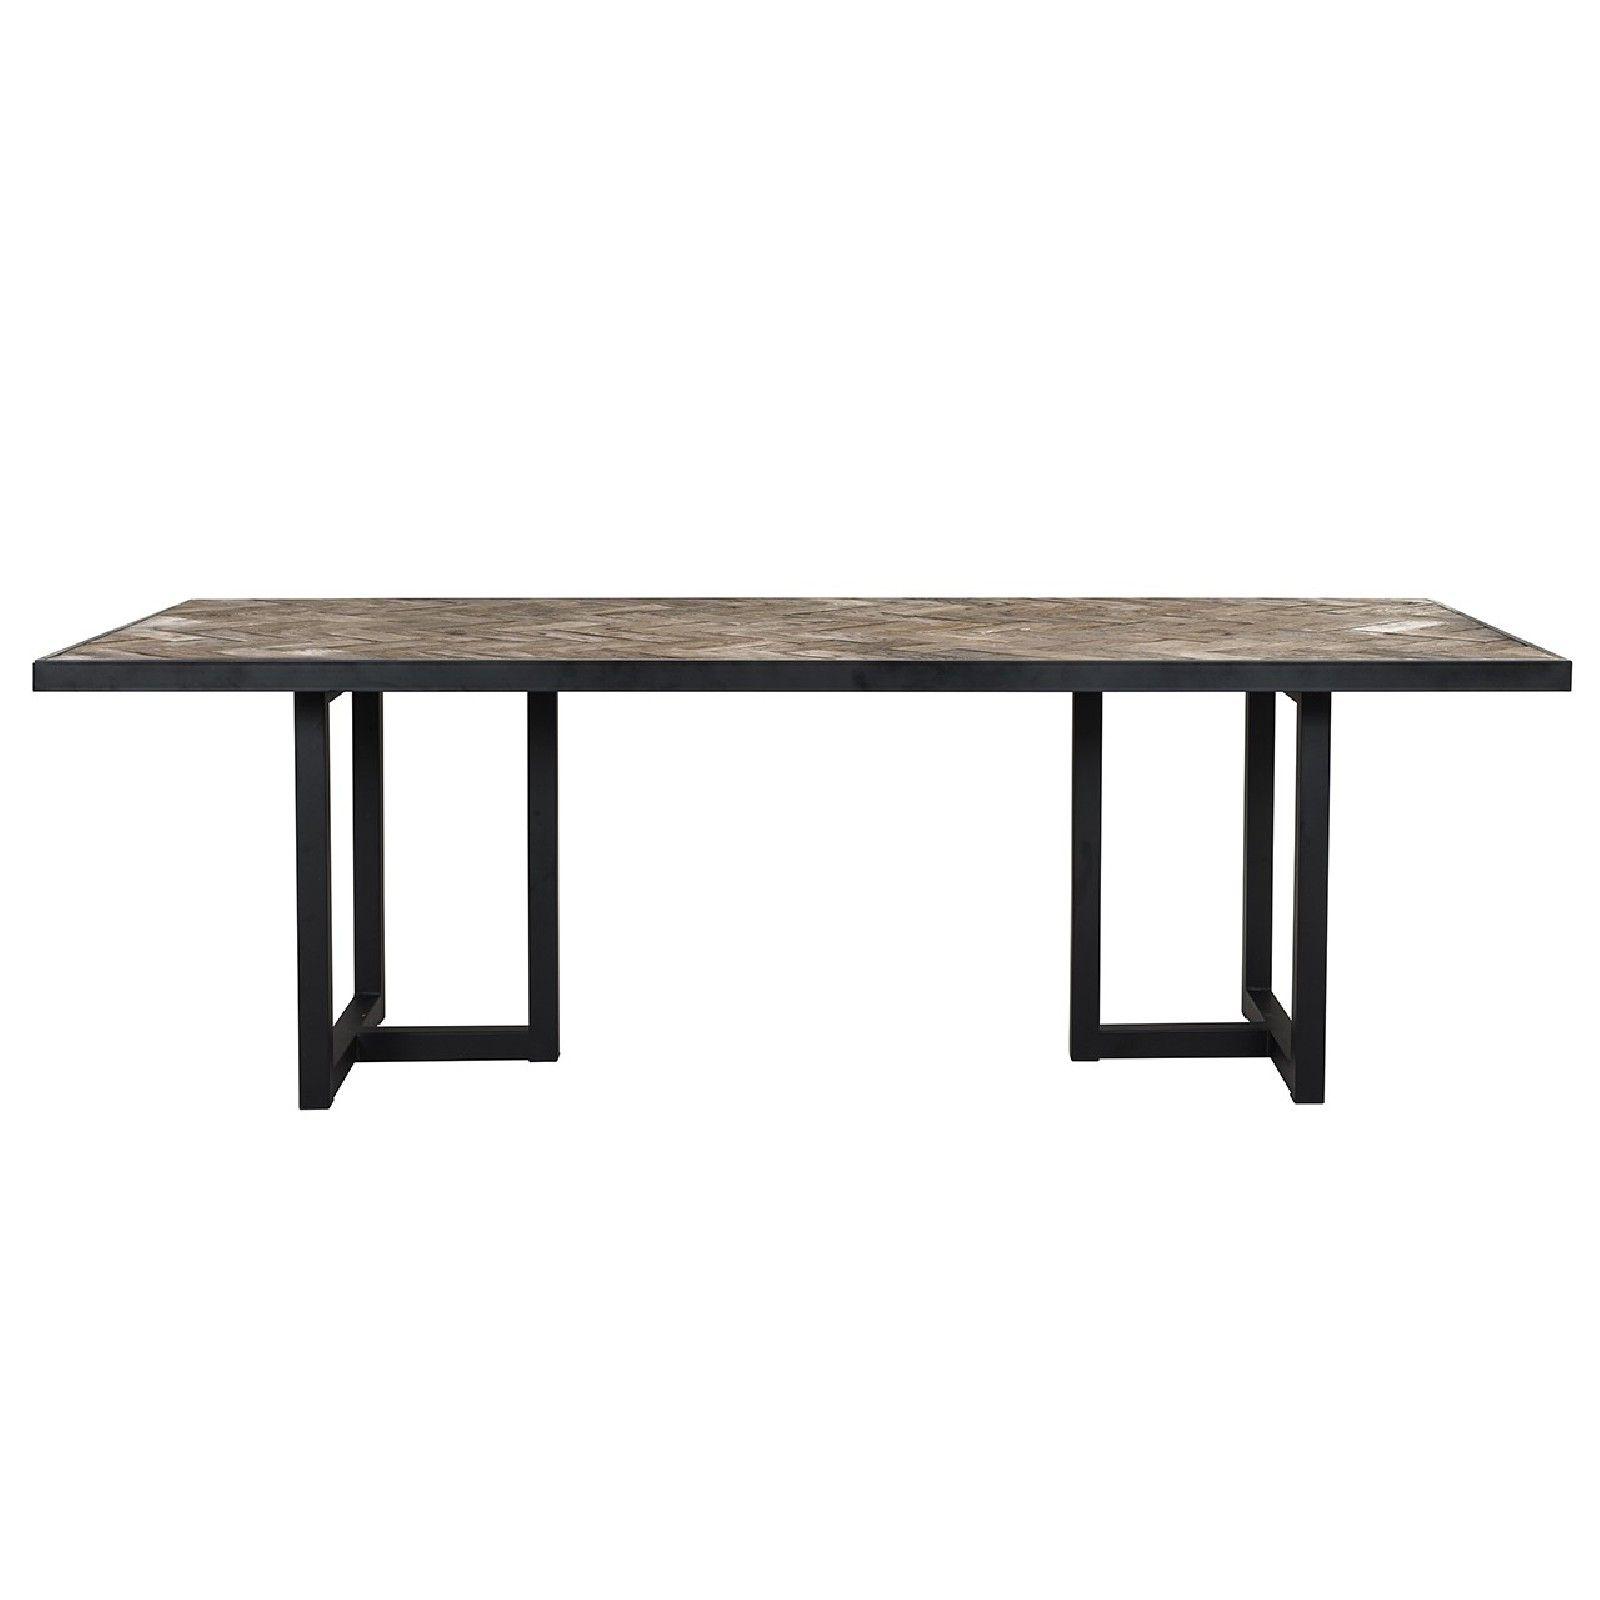 Table à dîner Herringbone 200 Meuble Déco Tendance - 656